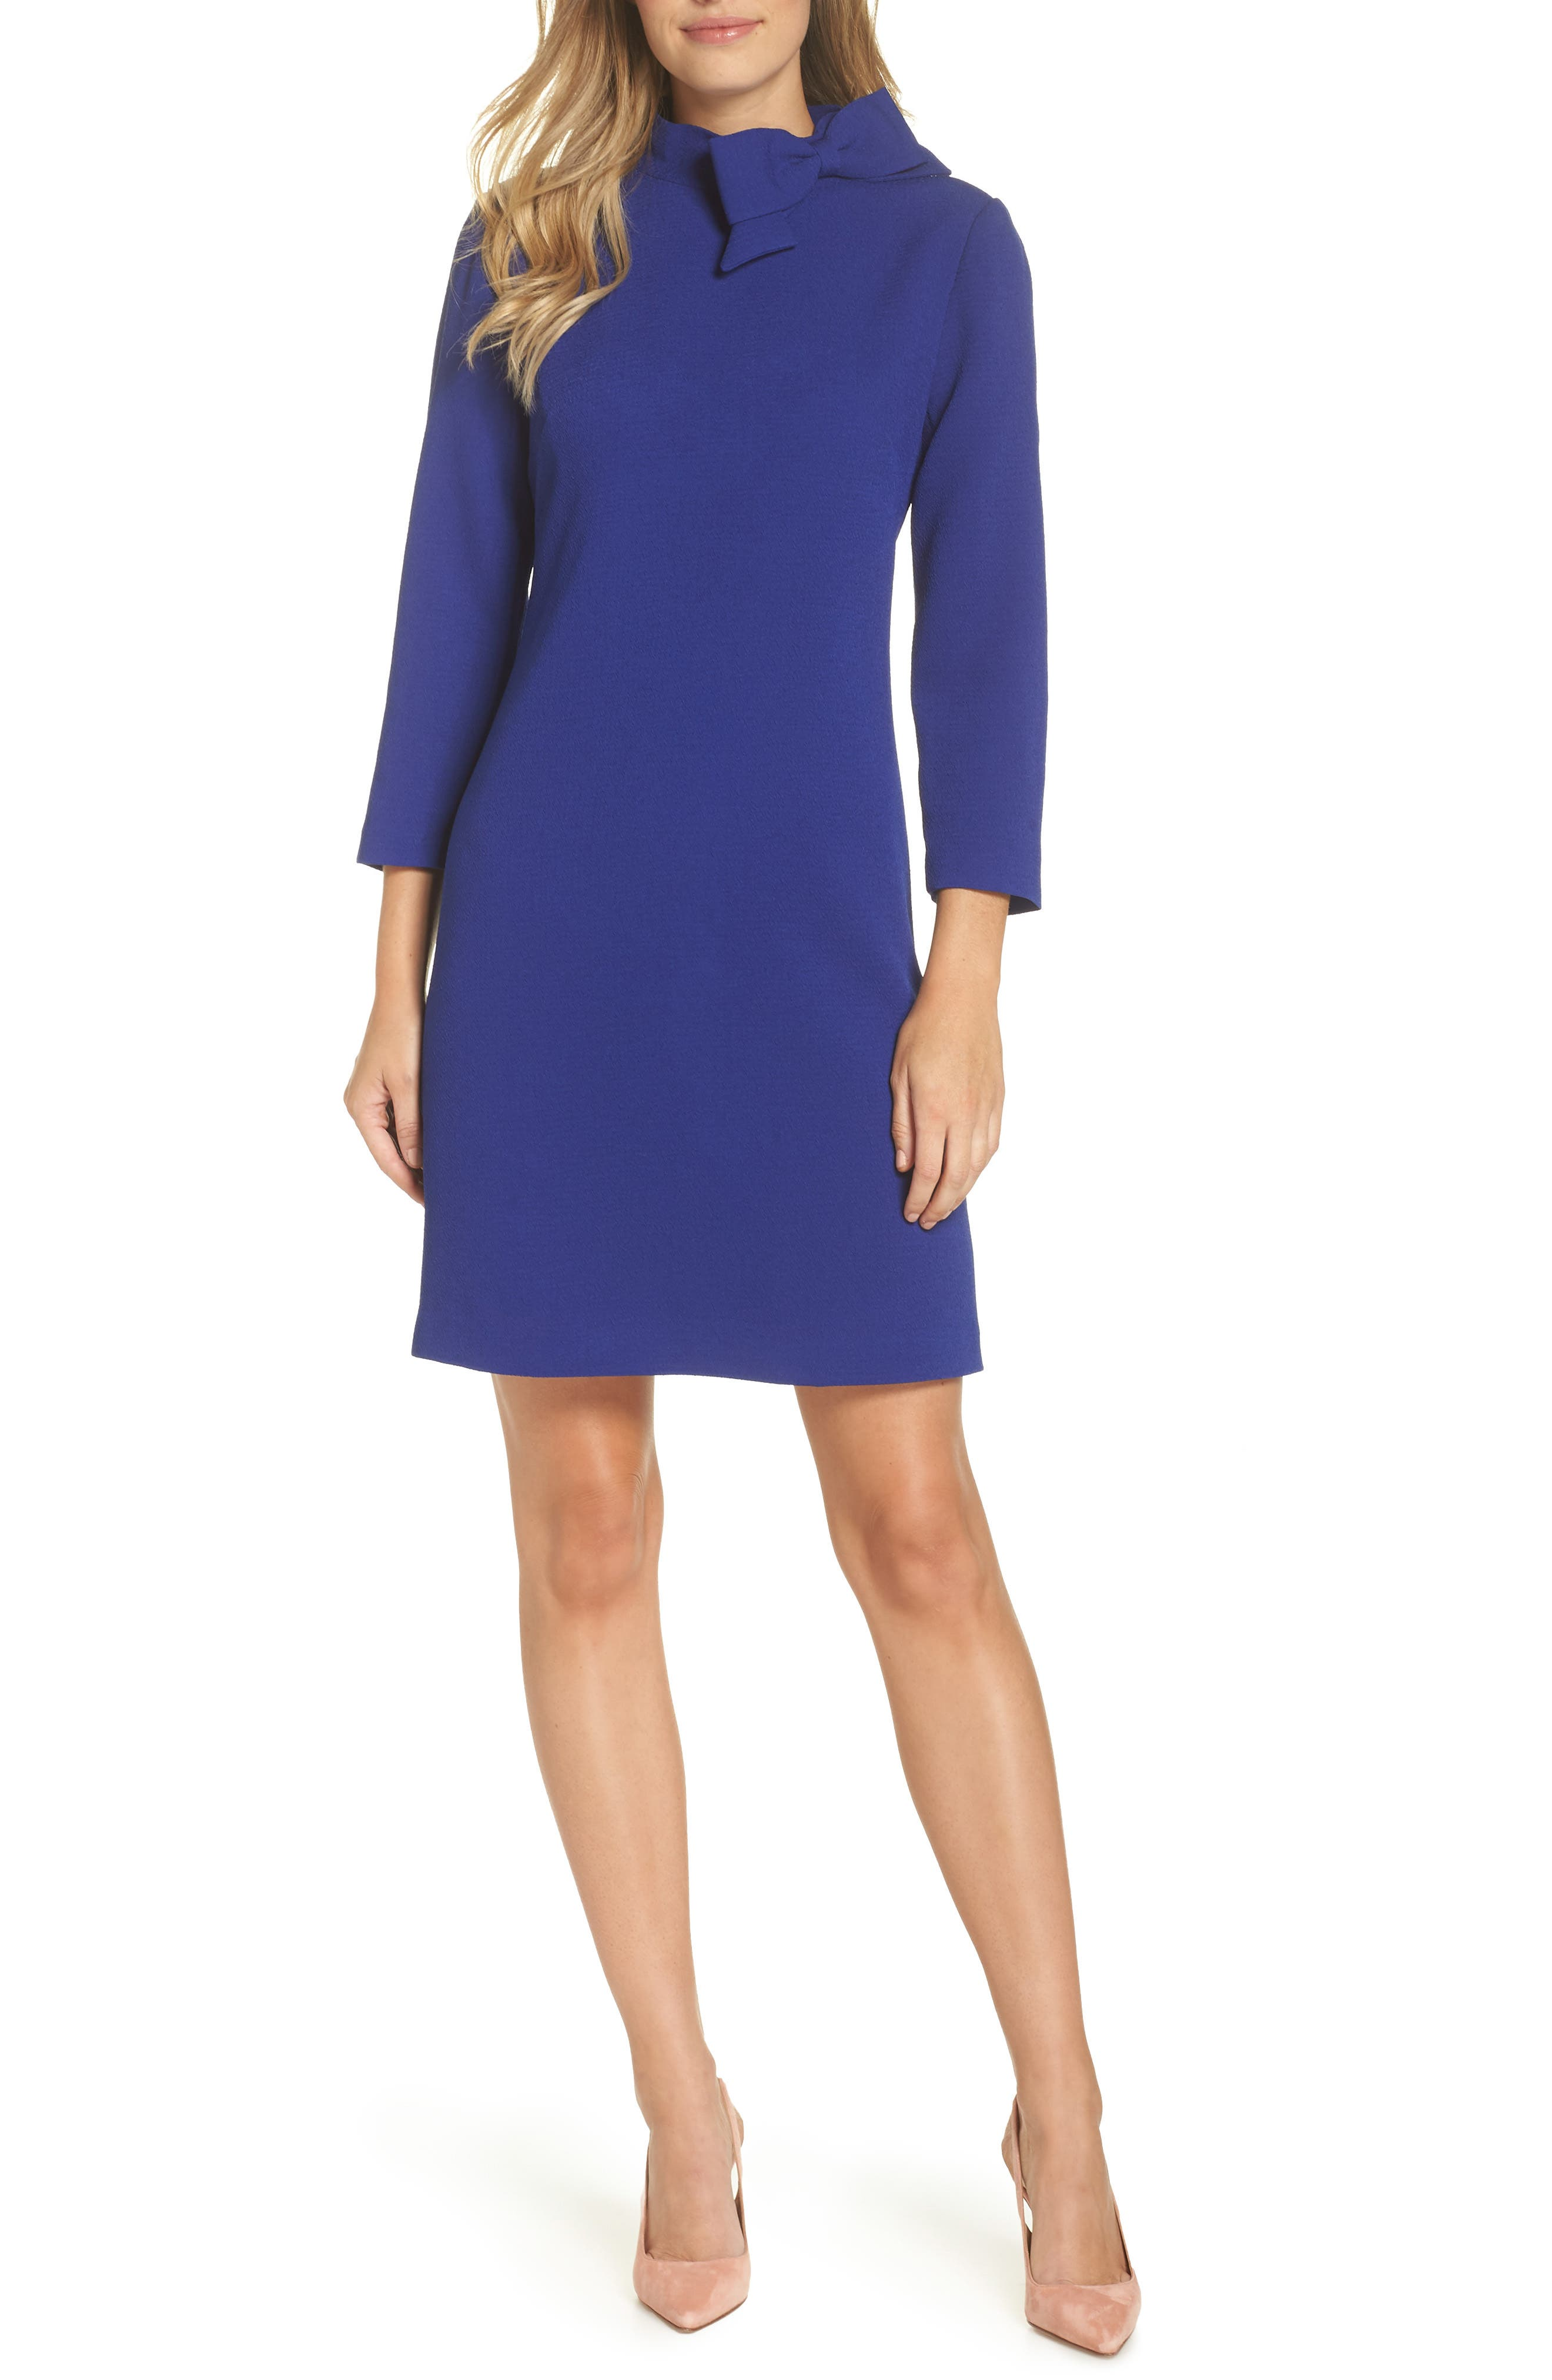 Eliza J Bow Neck Crepe Shift Dress, 8 (similar to 1) - Blue